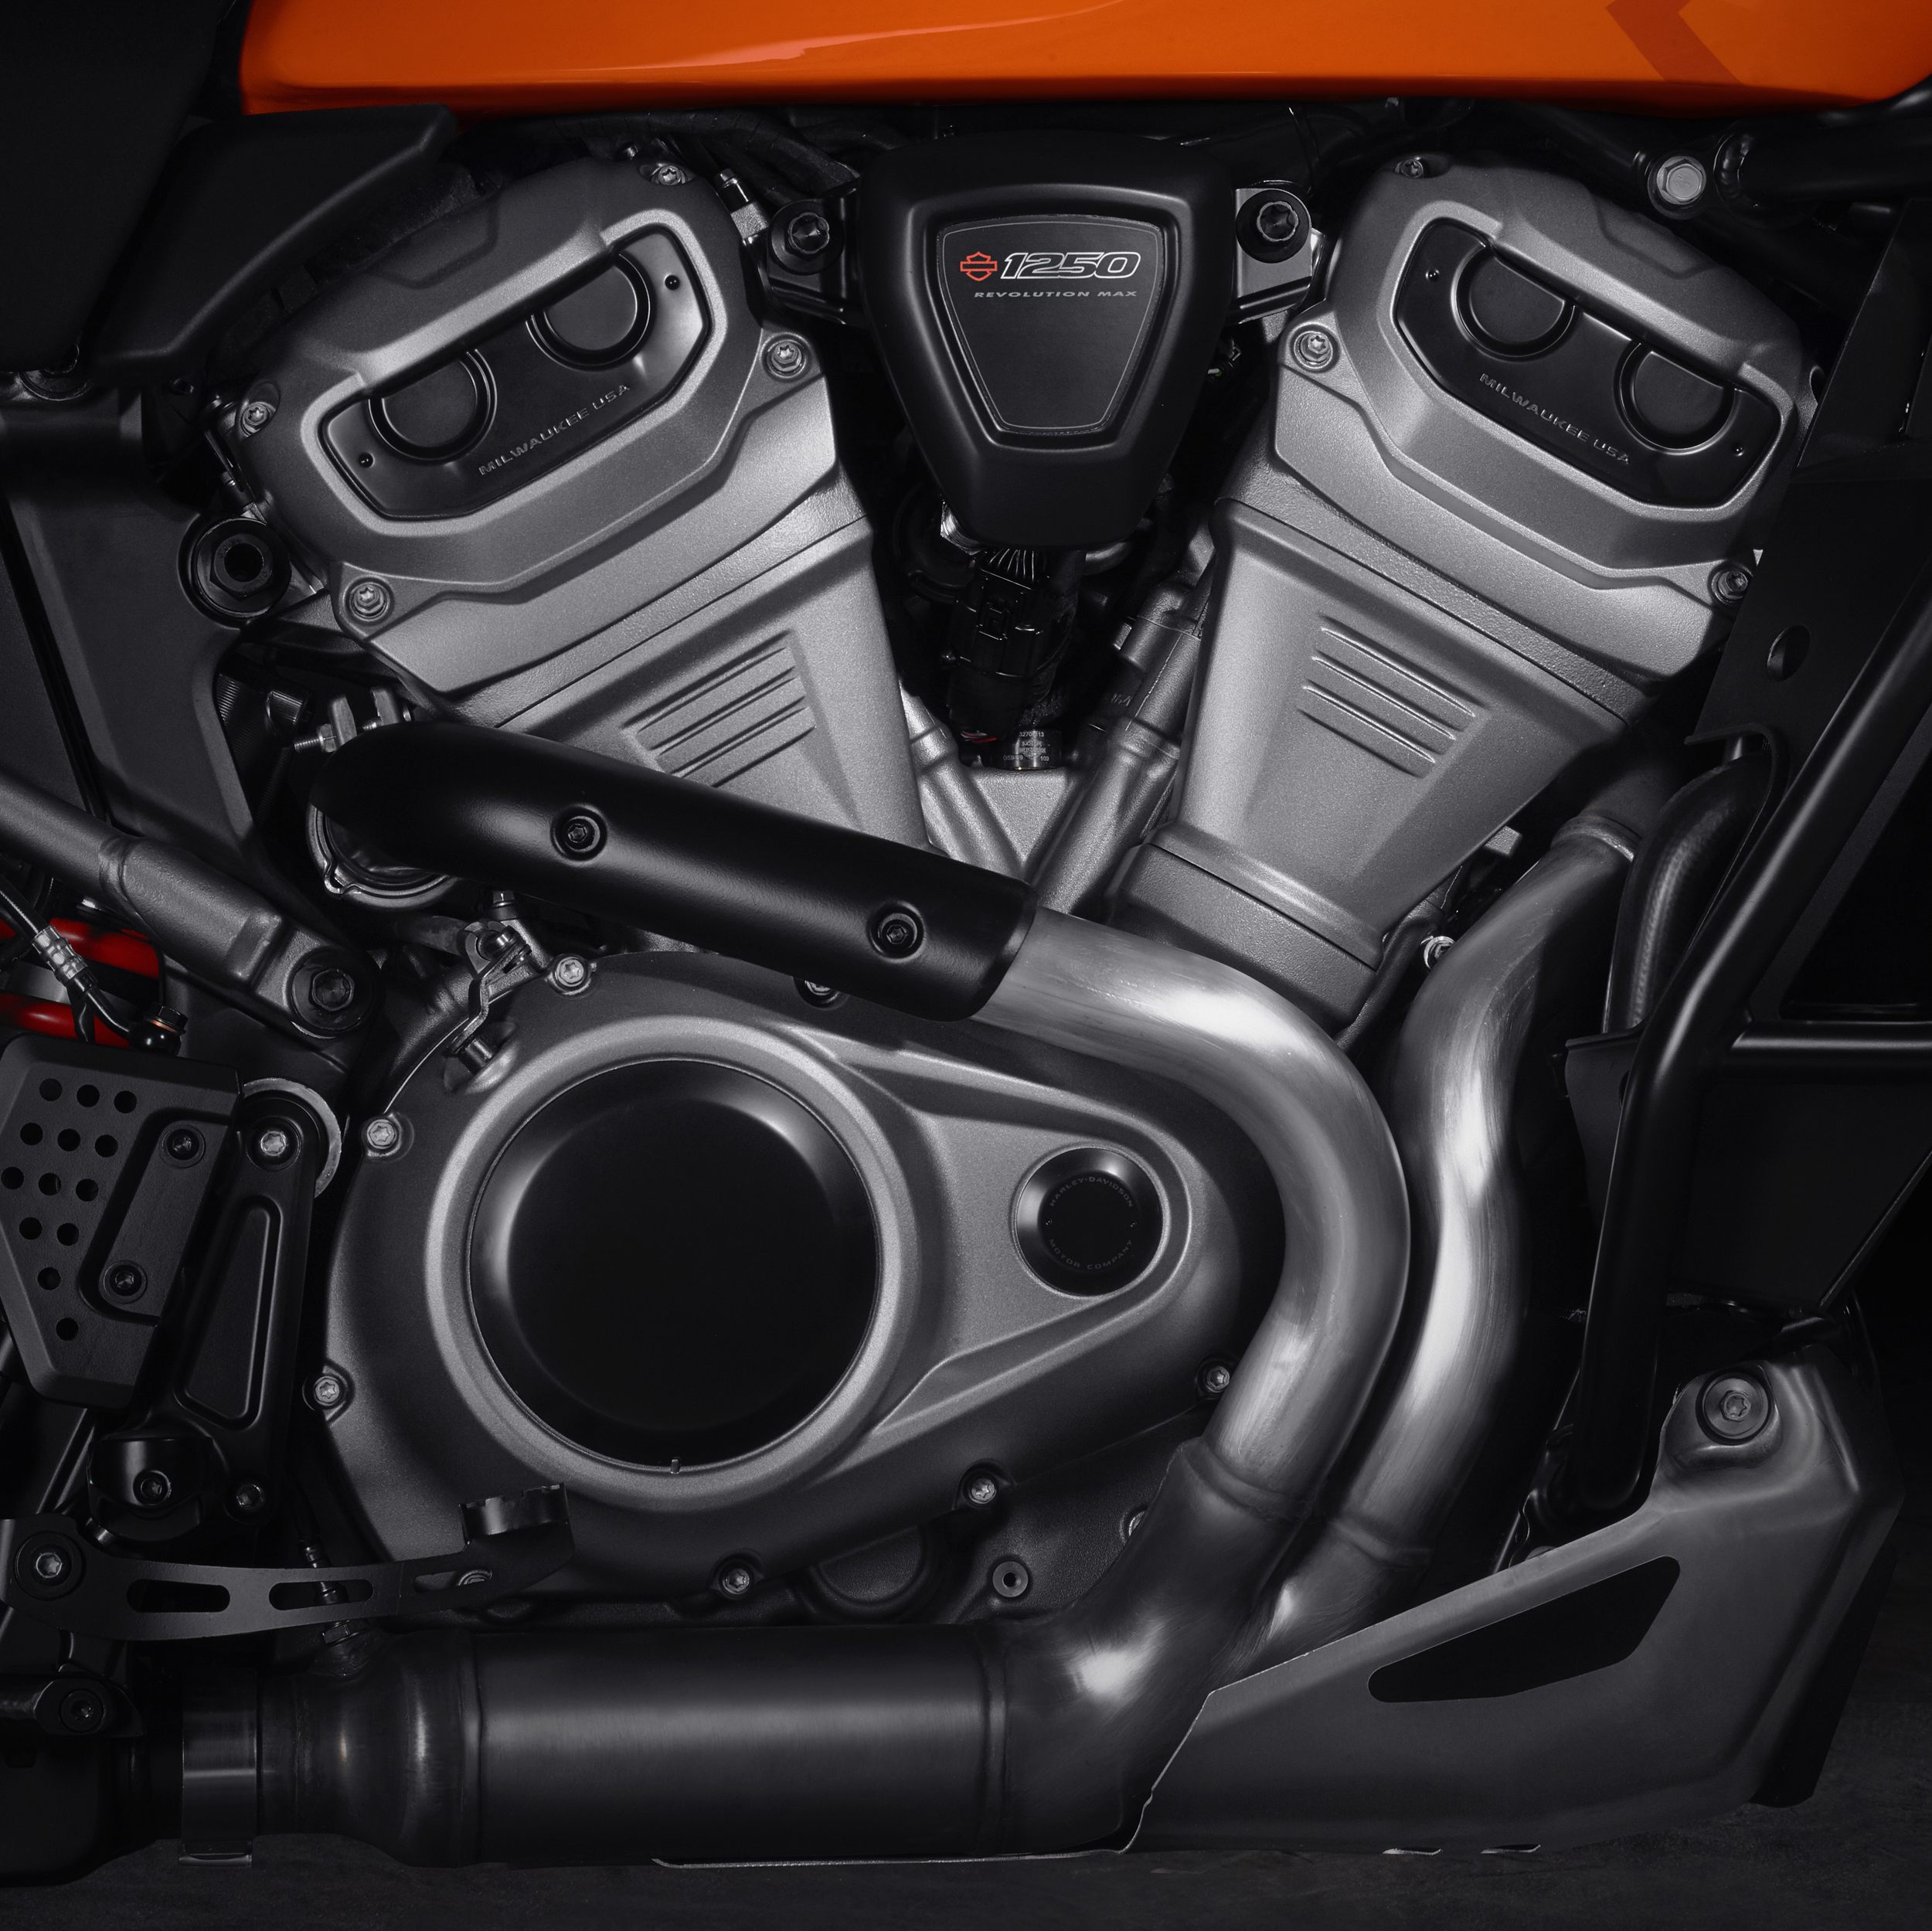 Harley-Davidson Revolution Max 1205